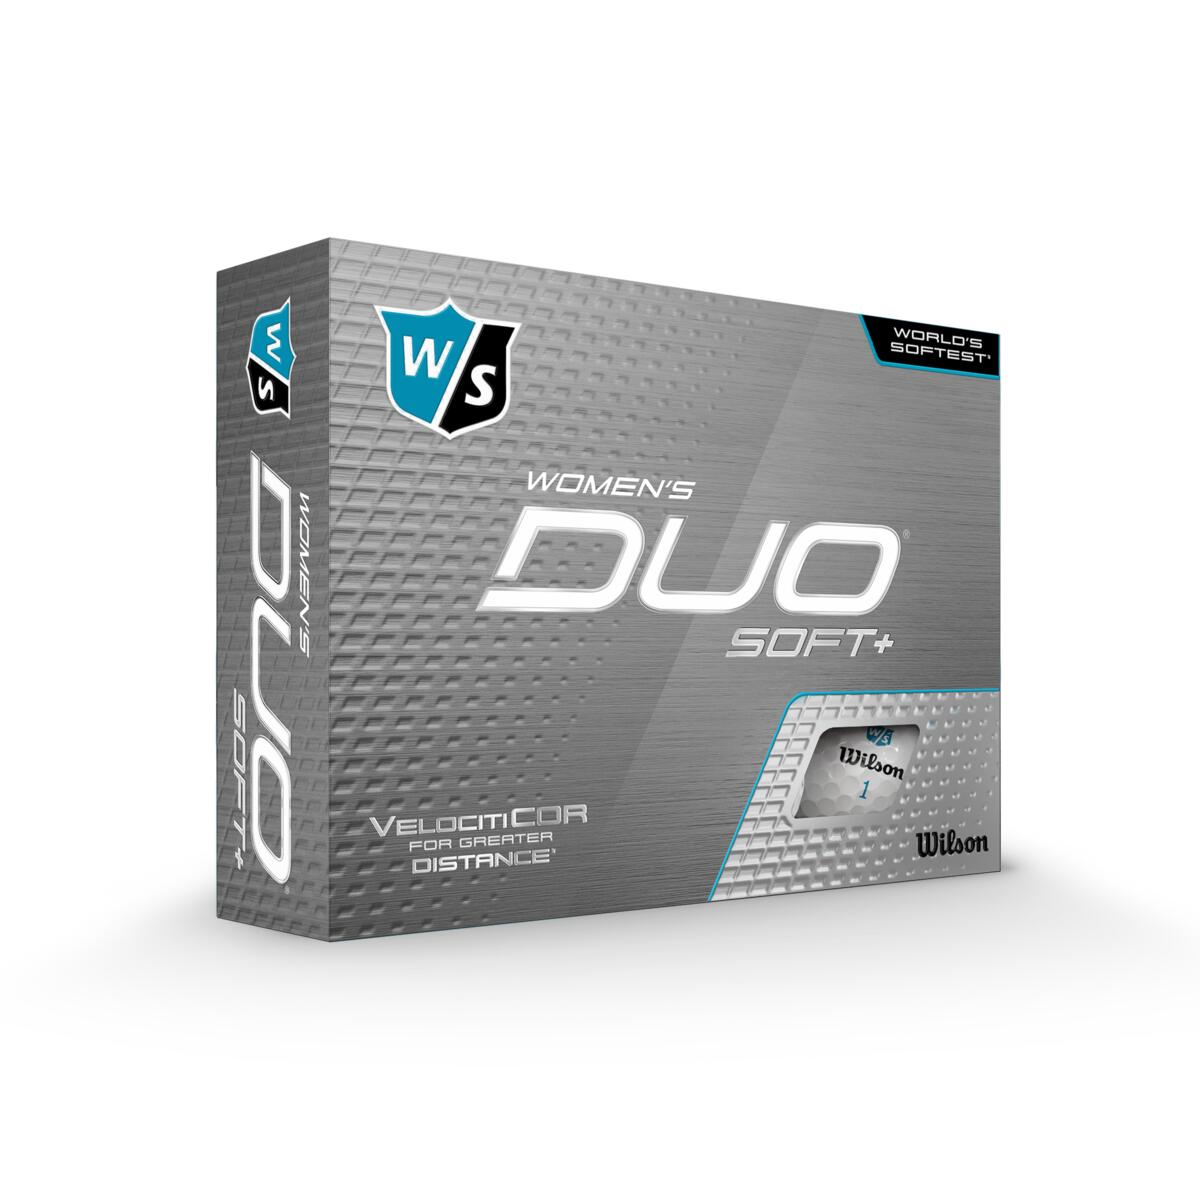 Wilson - Duo Soft+ White - 12pack - Kvinde Golfbolde